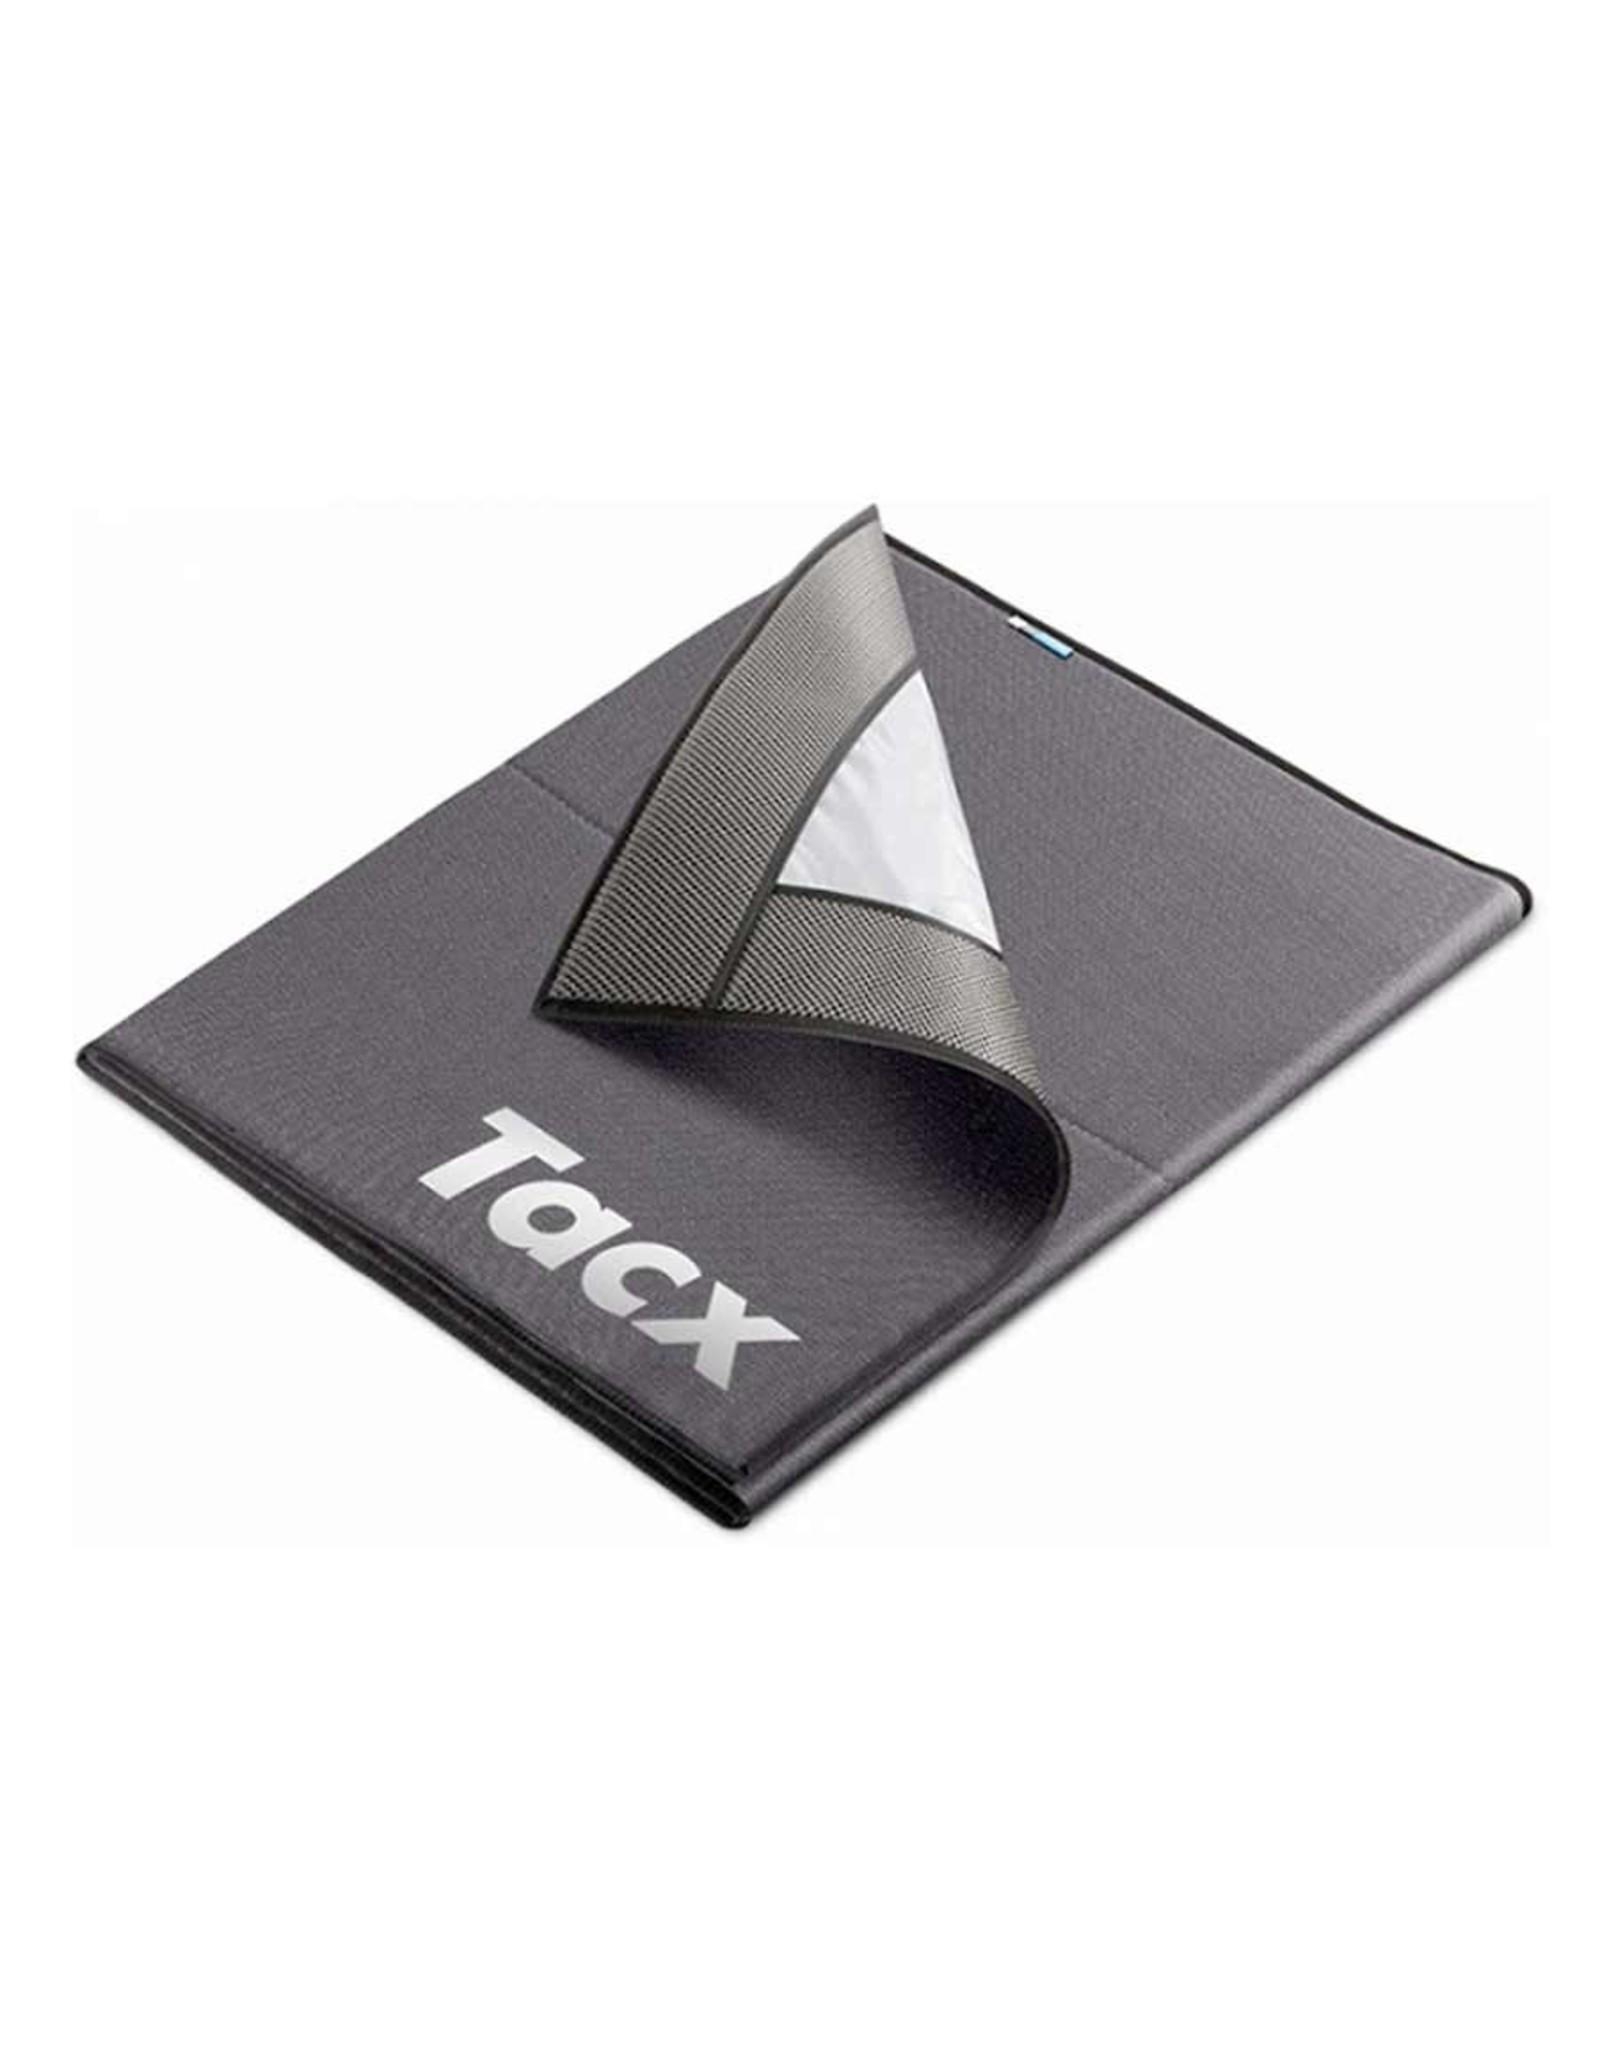 Tacx foldable training mattress - Black